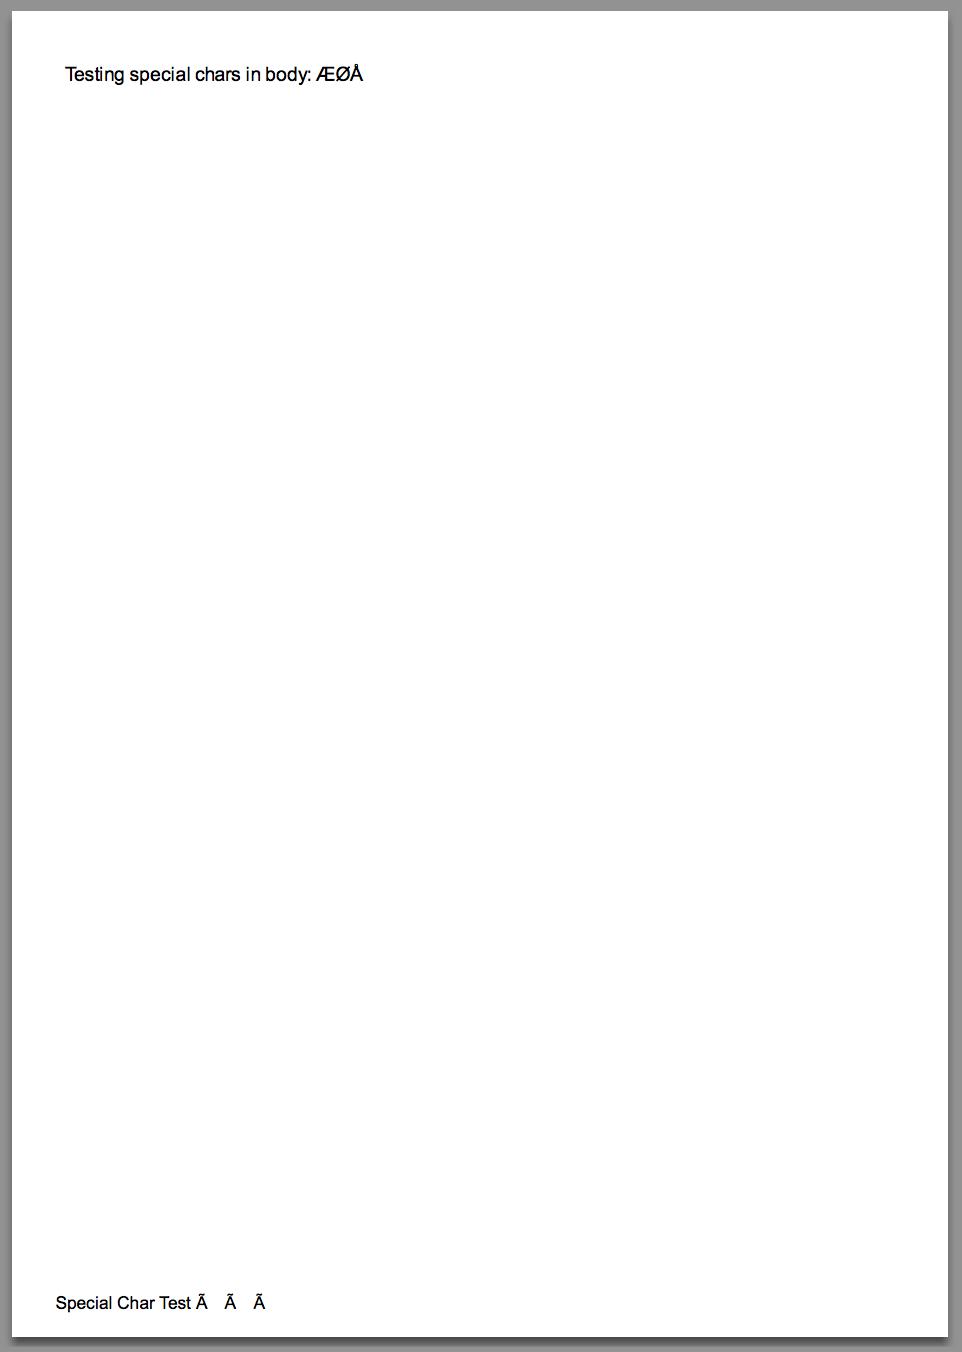 screenshot 2014-02-10 00 32 20